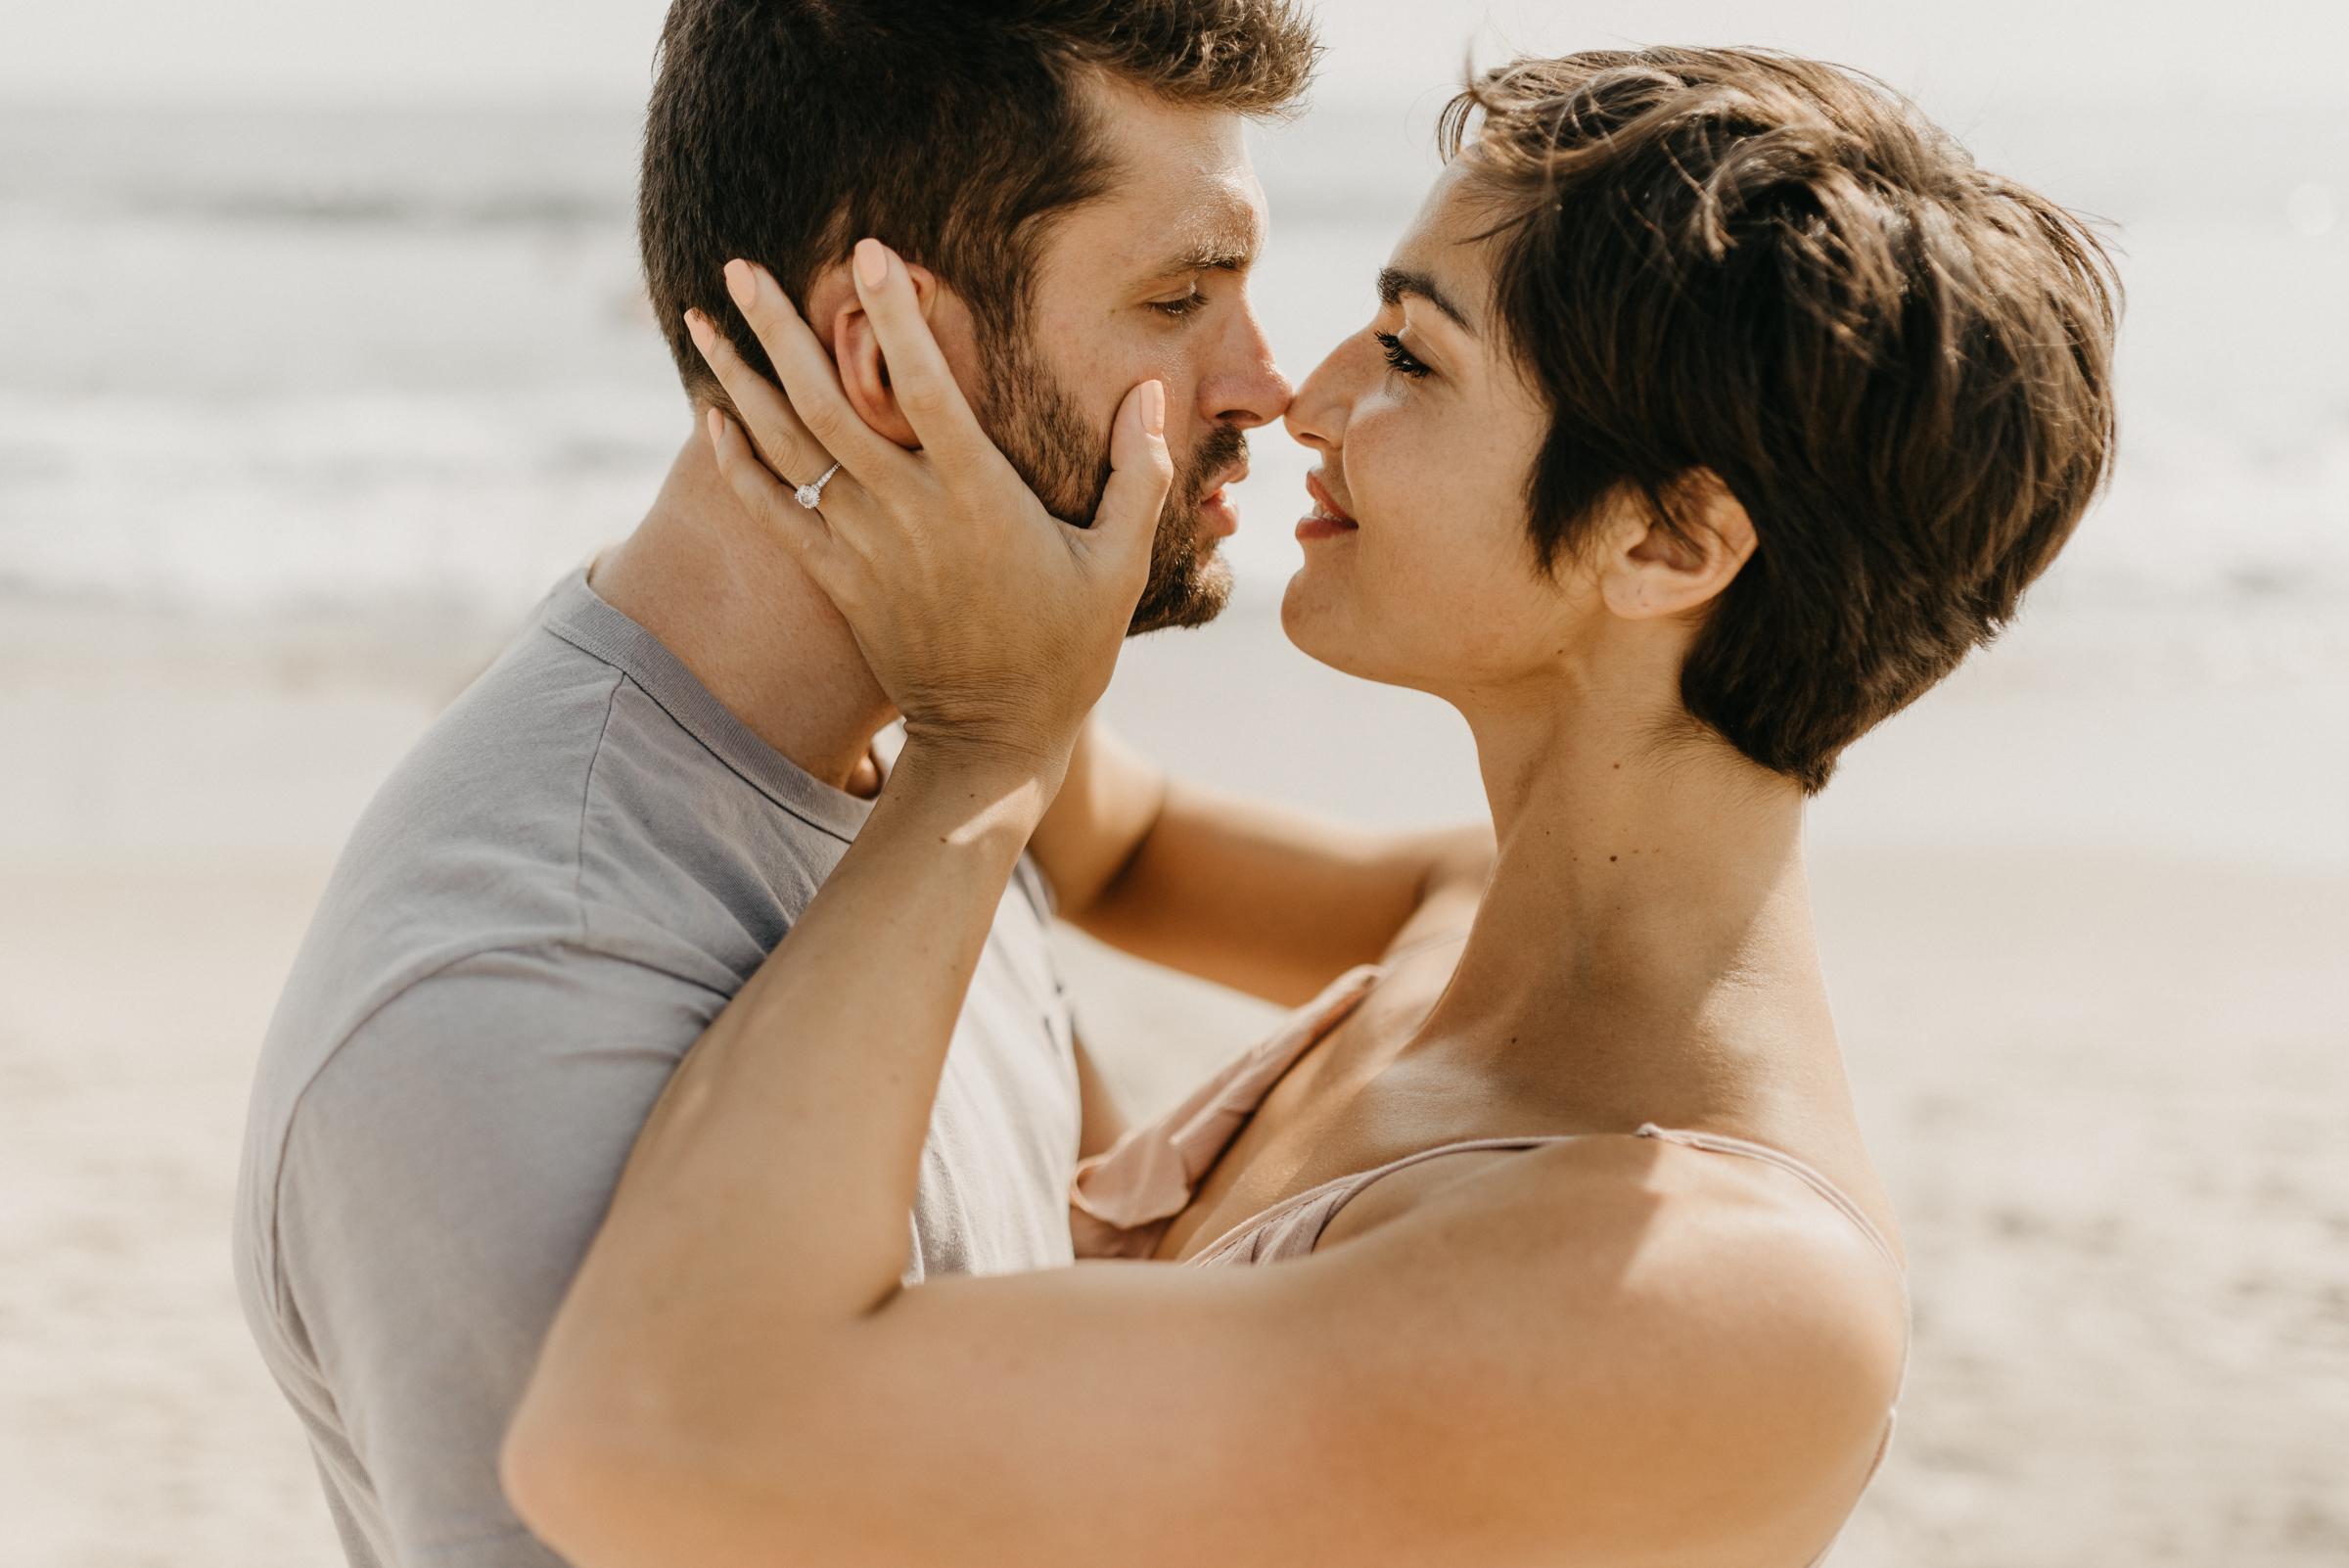 Isaiah + Taylor Photography - Venice Beach & Santa Monica Engagement Session, Los Angeles Wedding Photographer-060.jpg